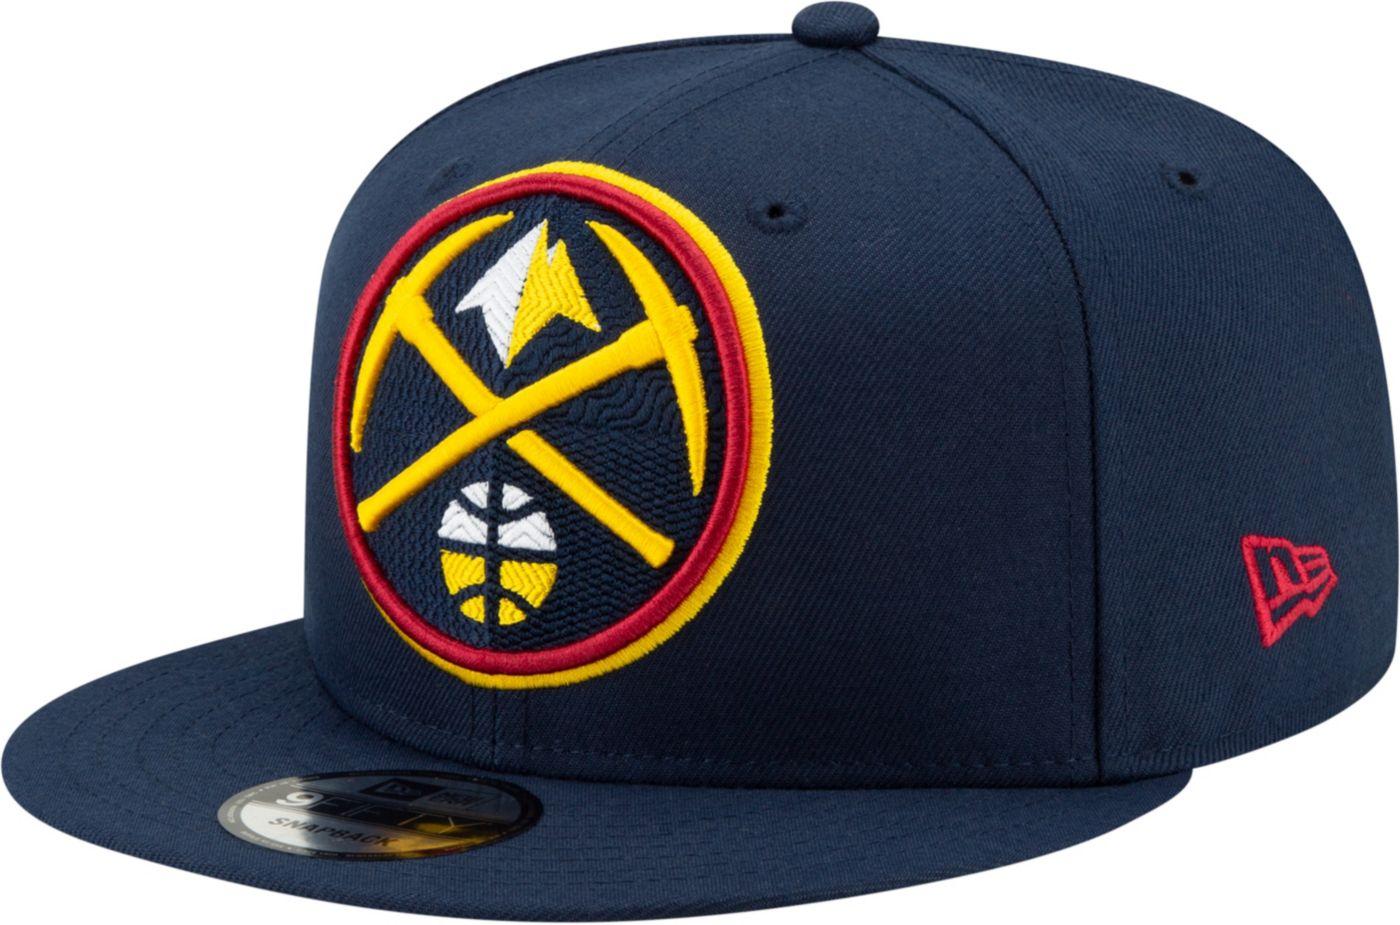 New Era Youth Denver Nuggets 9Fifty Adjustable Snapback Hat